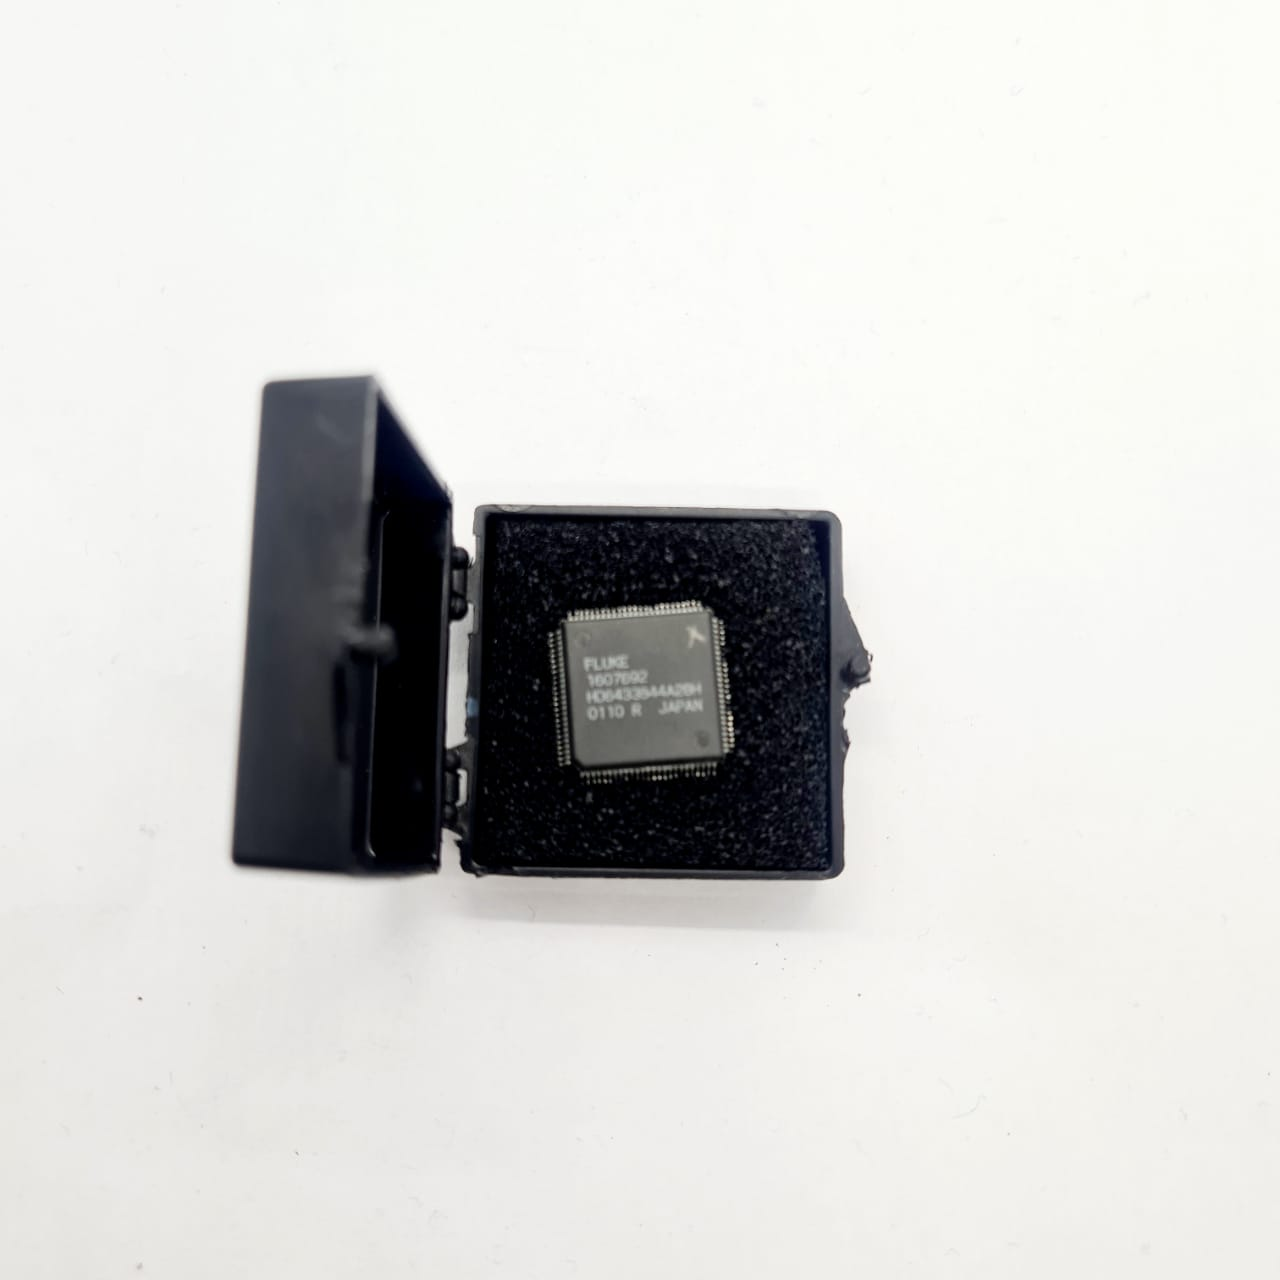 Circuito Integrado FLUKE 1607692 HD6433844A28H JAPAN CI 32